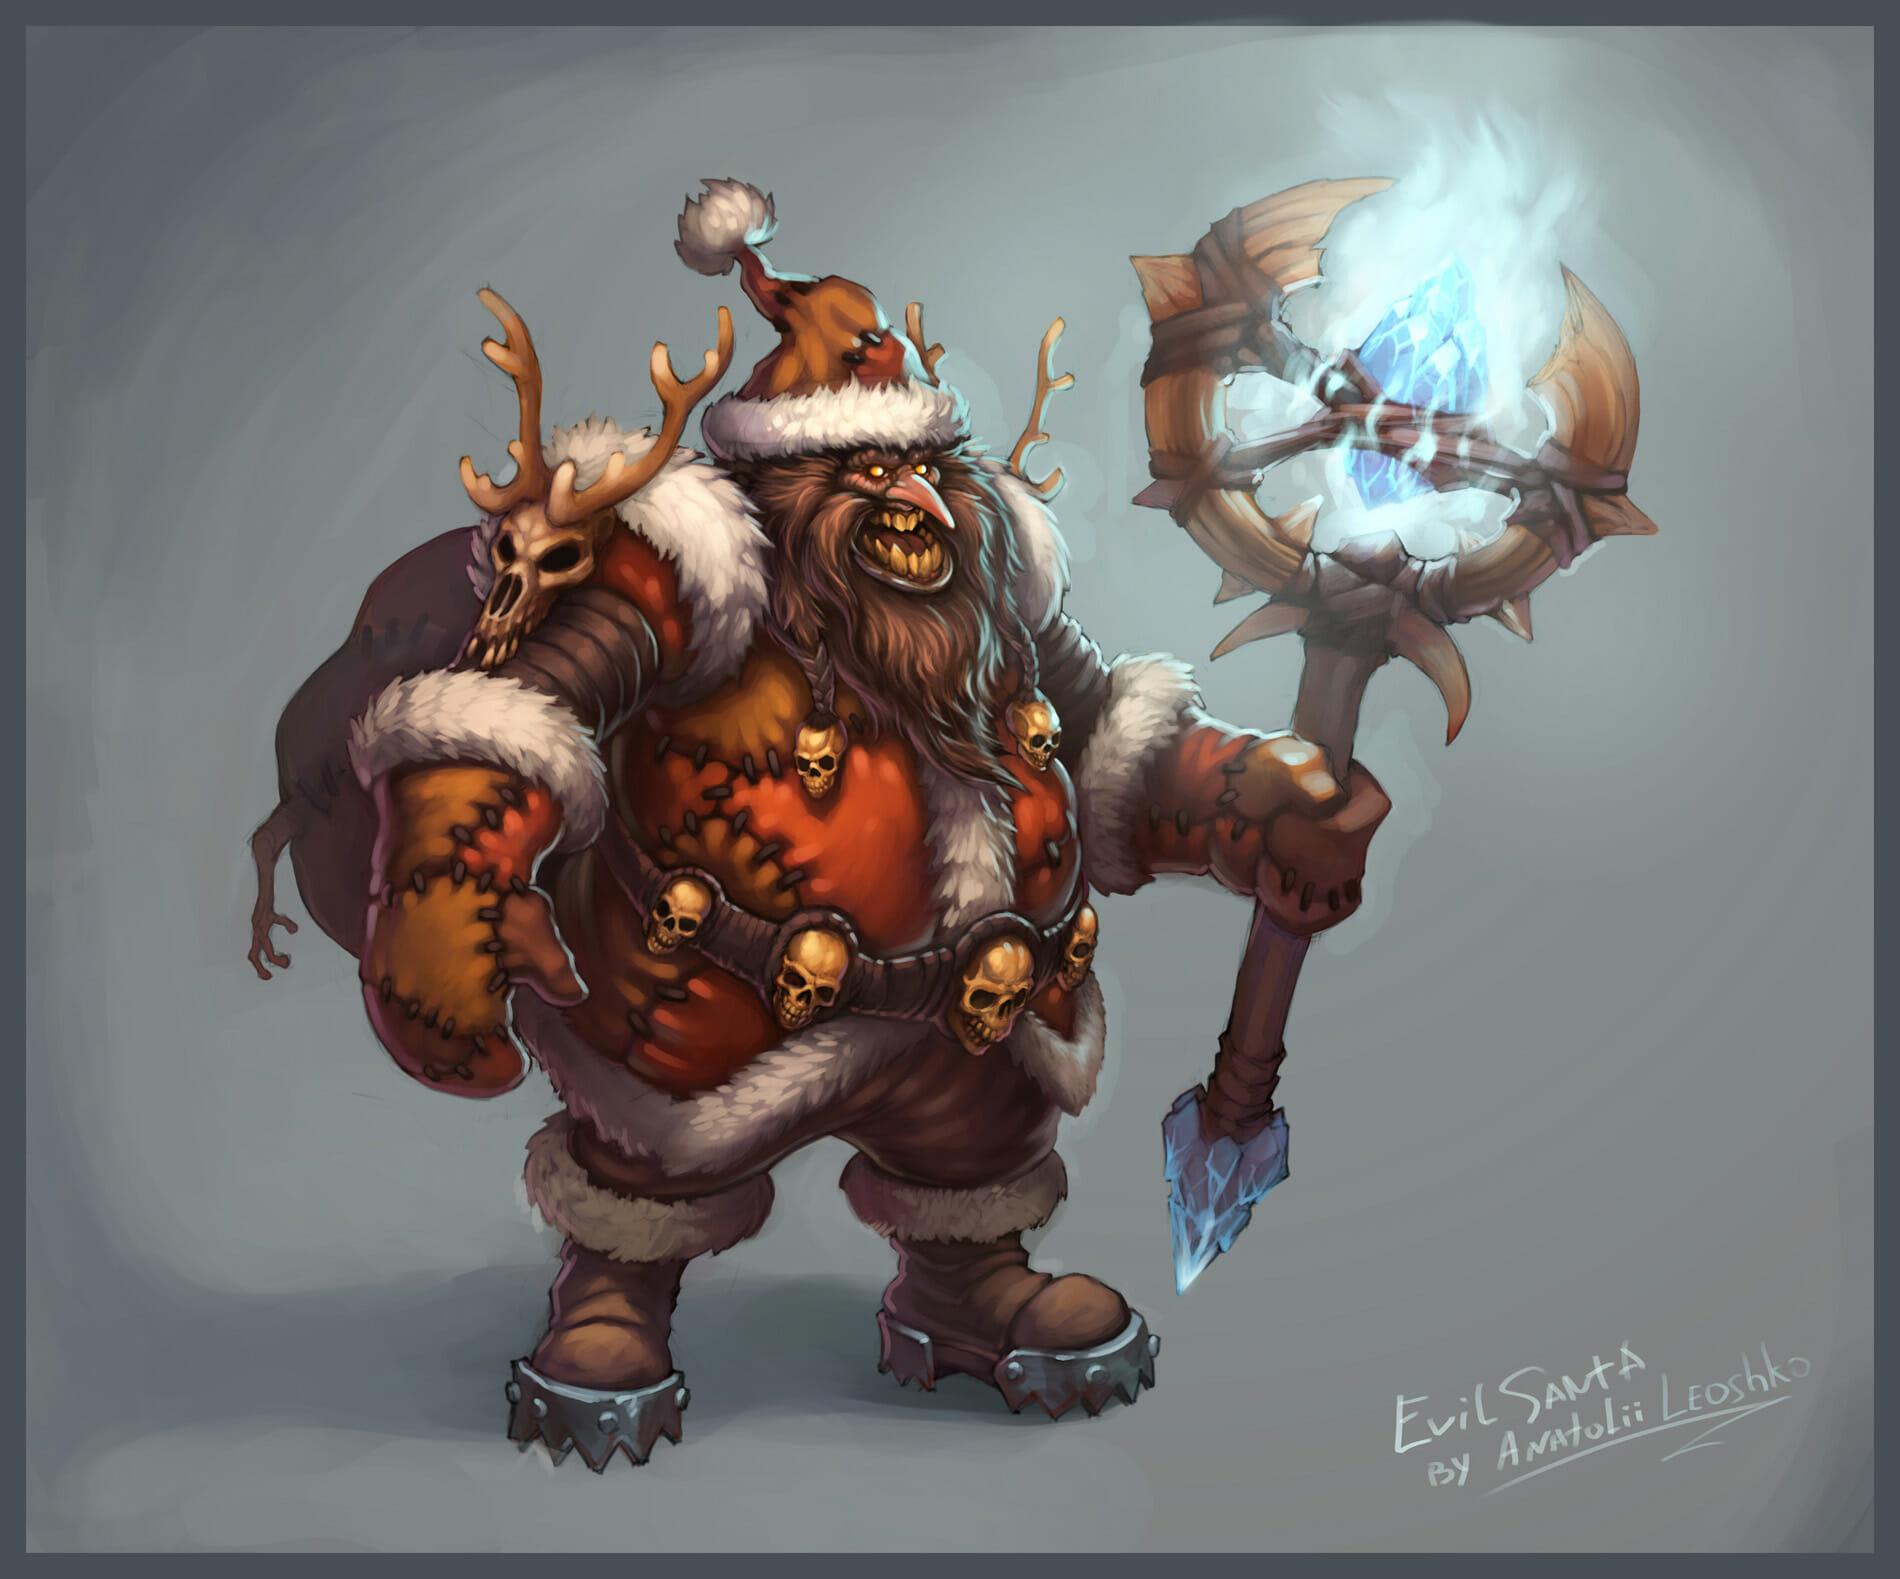 evil_santa_by_khezug-d5j0mwf